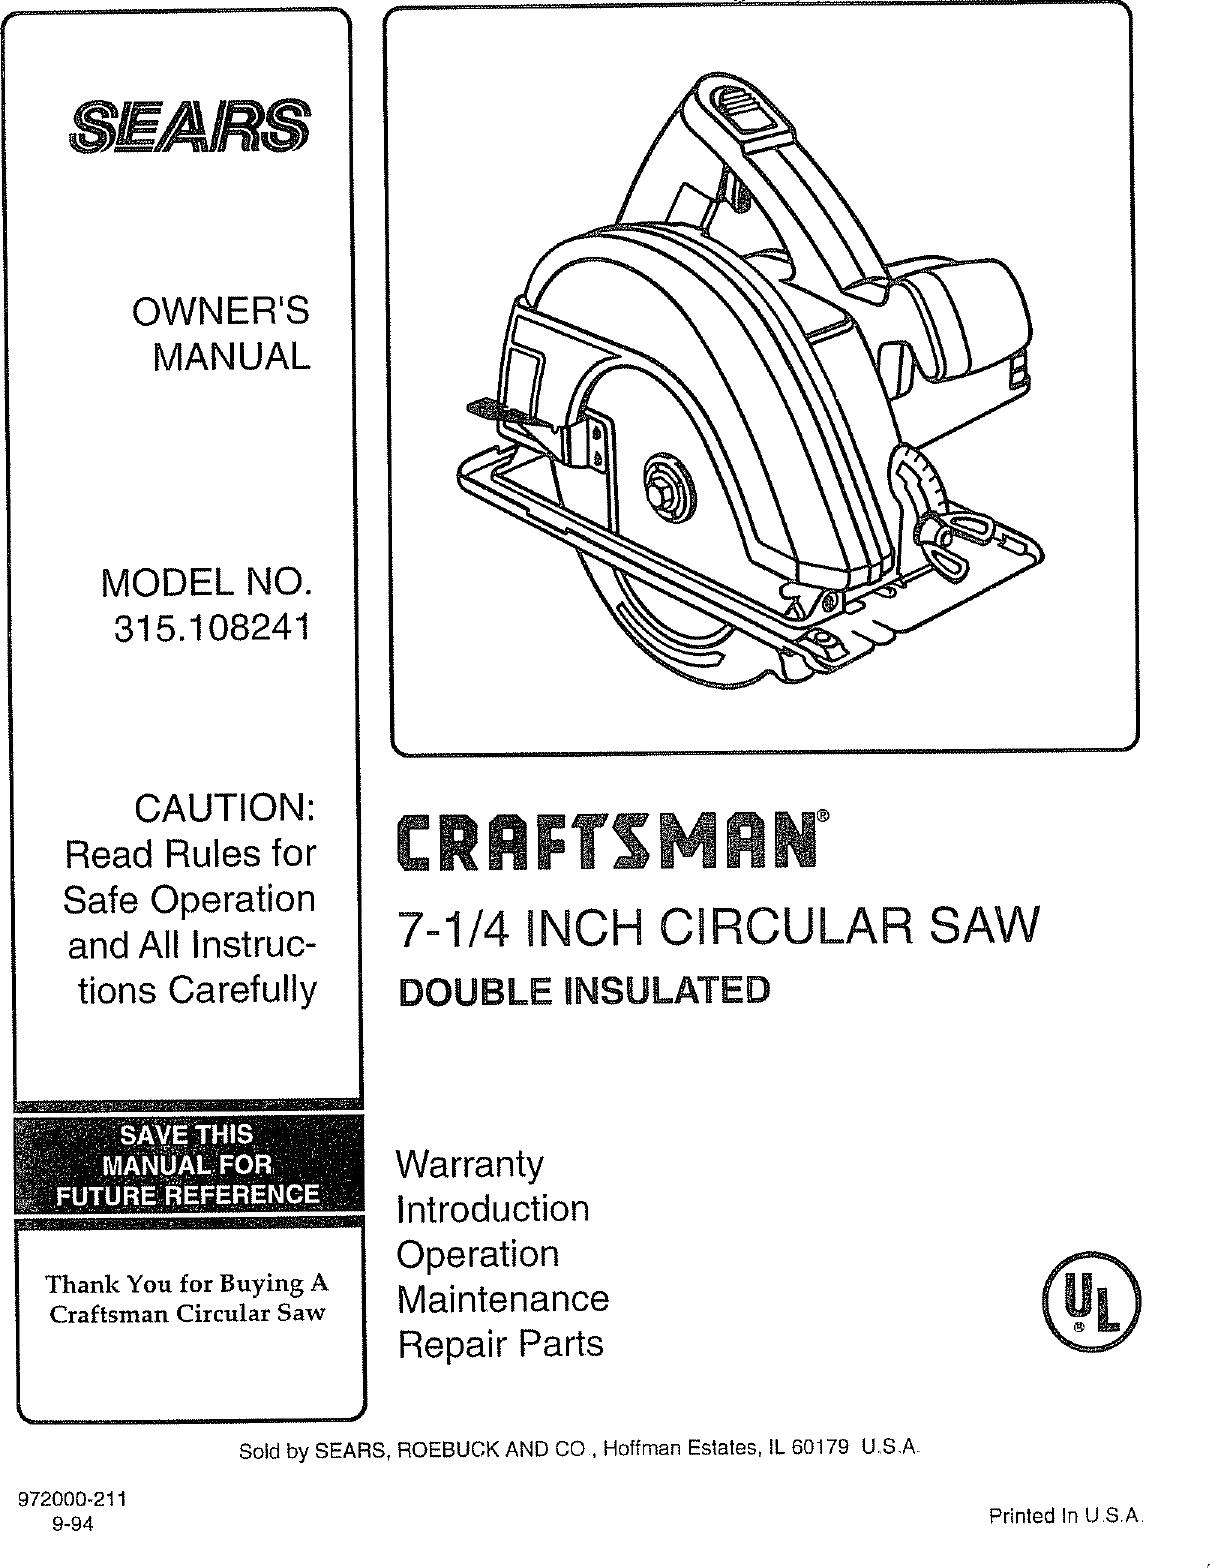 craftsman 315108241 user manual circular saw manuals and guides l0807084 rh usermanual wiki craftsman 19.2 circular saw manual craftsman circular saw manual pdf